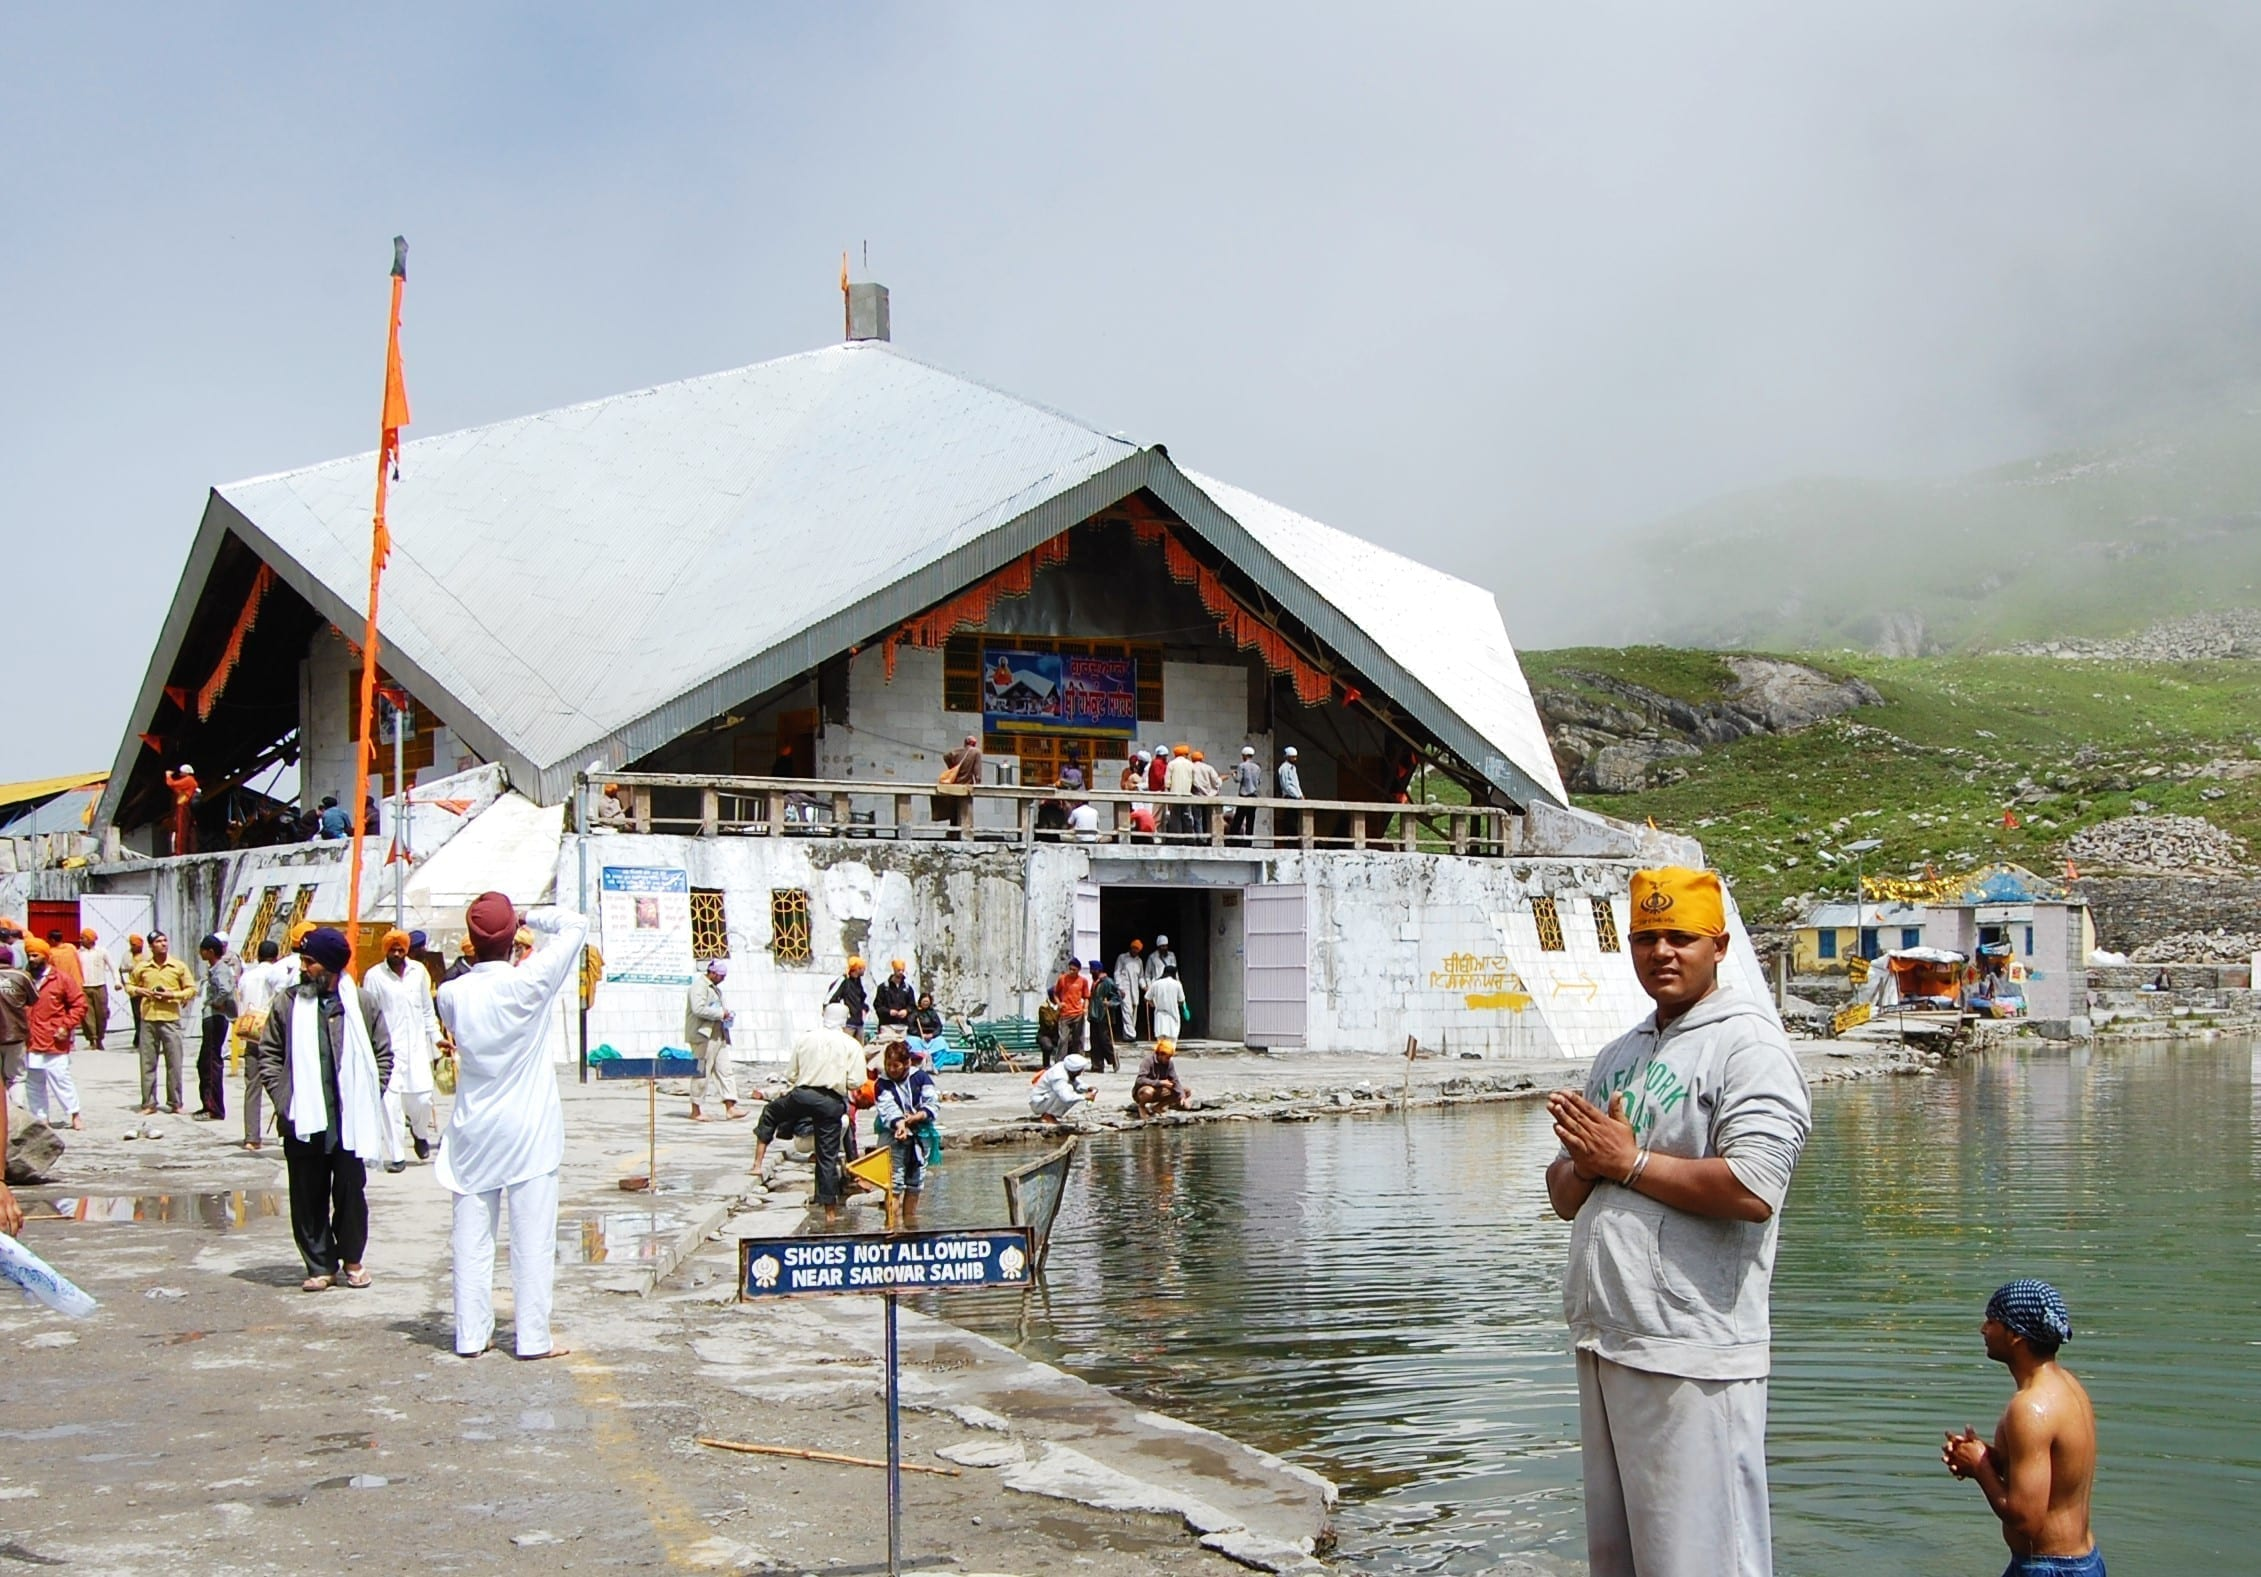 Hemkunt Sahib Gates Closed Due to Winter Season | Sikh24.com